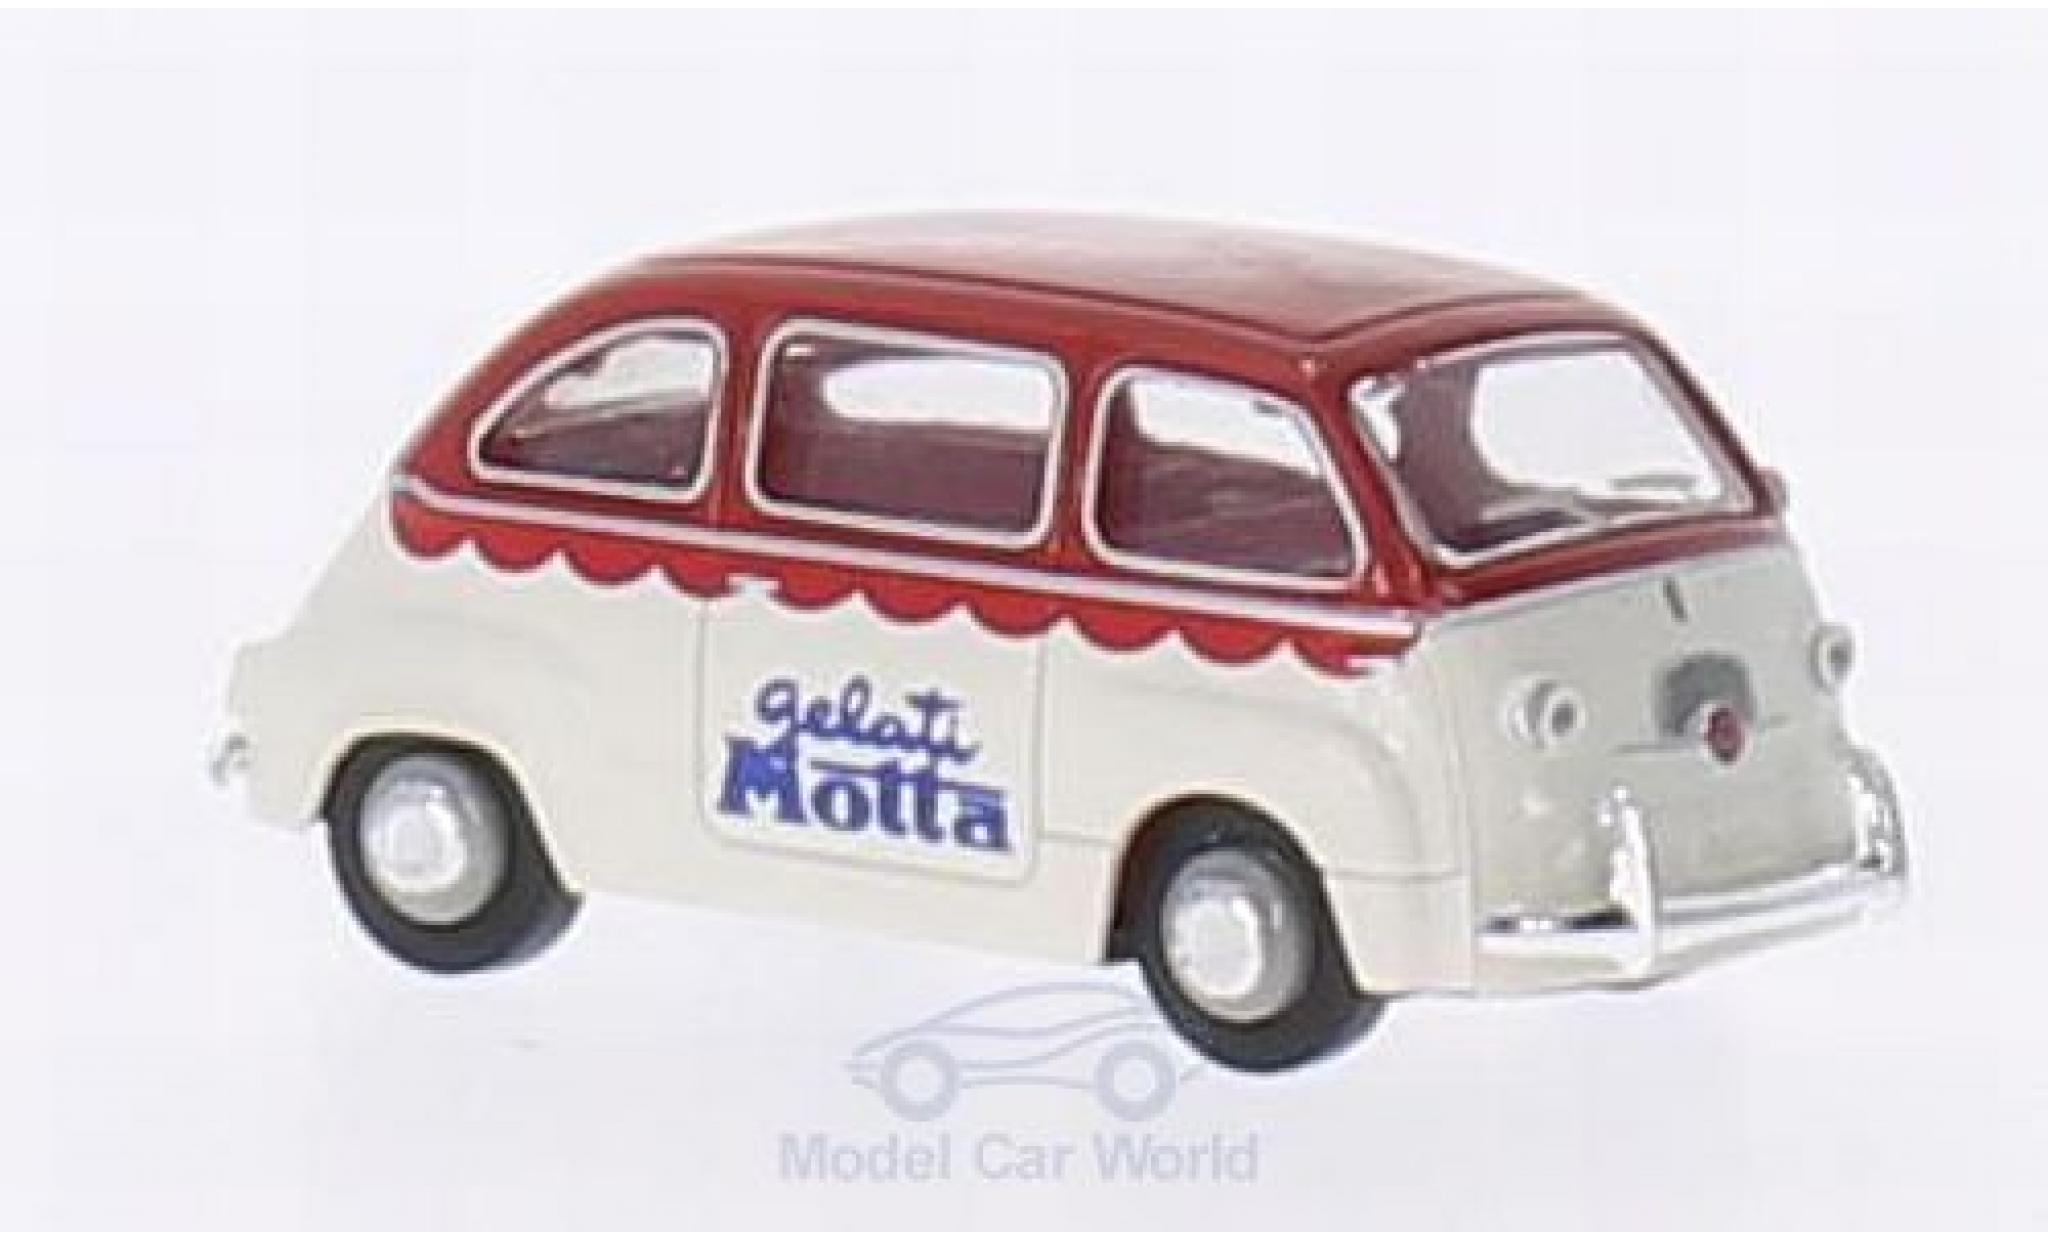 Fiat Multipla 1/87 Brekina Gelati Motta